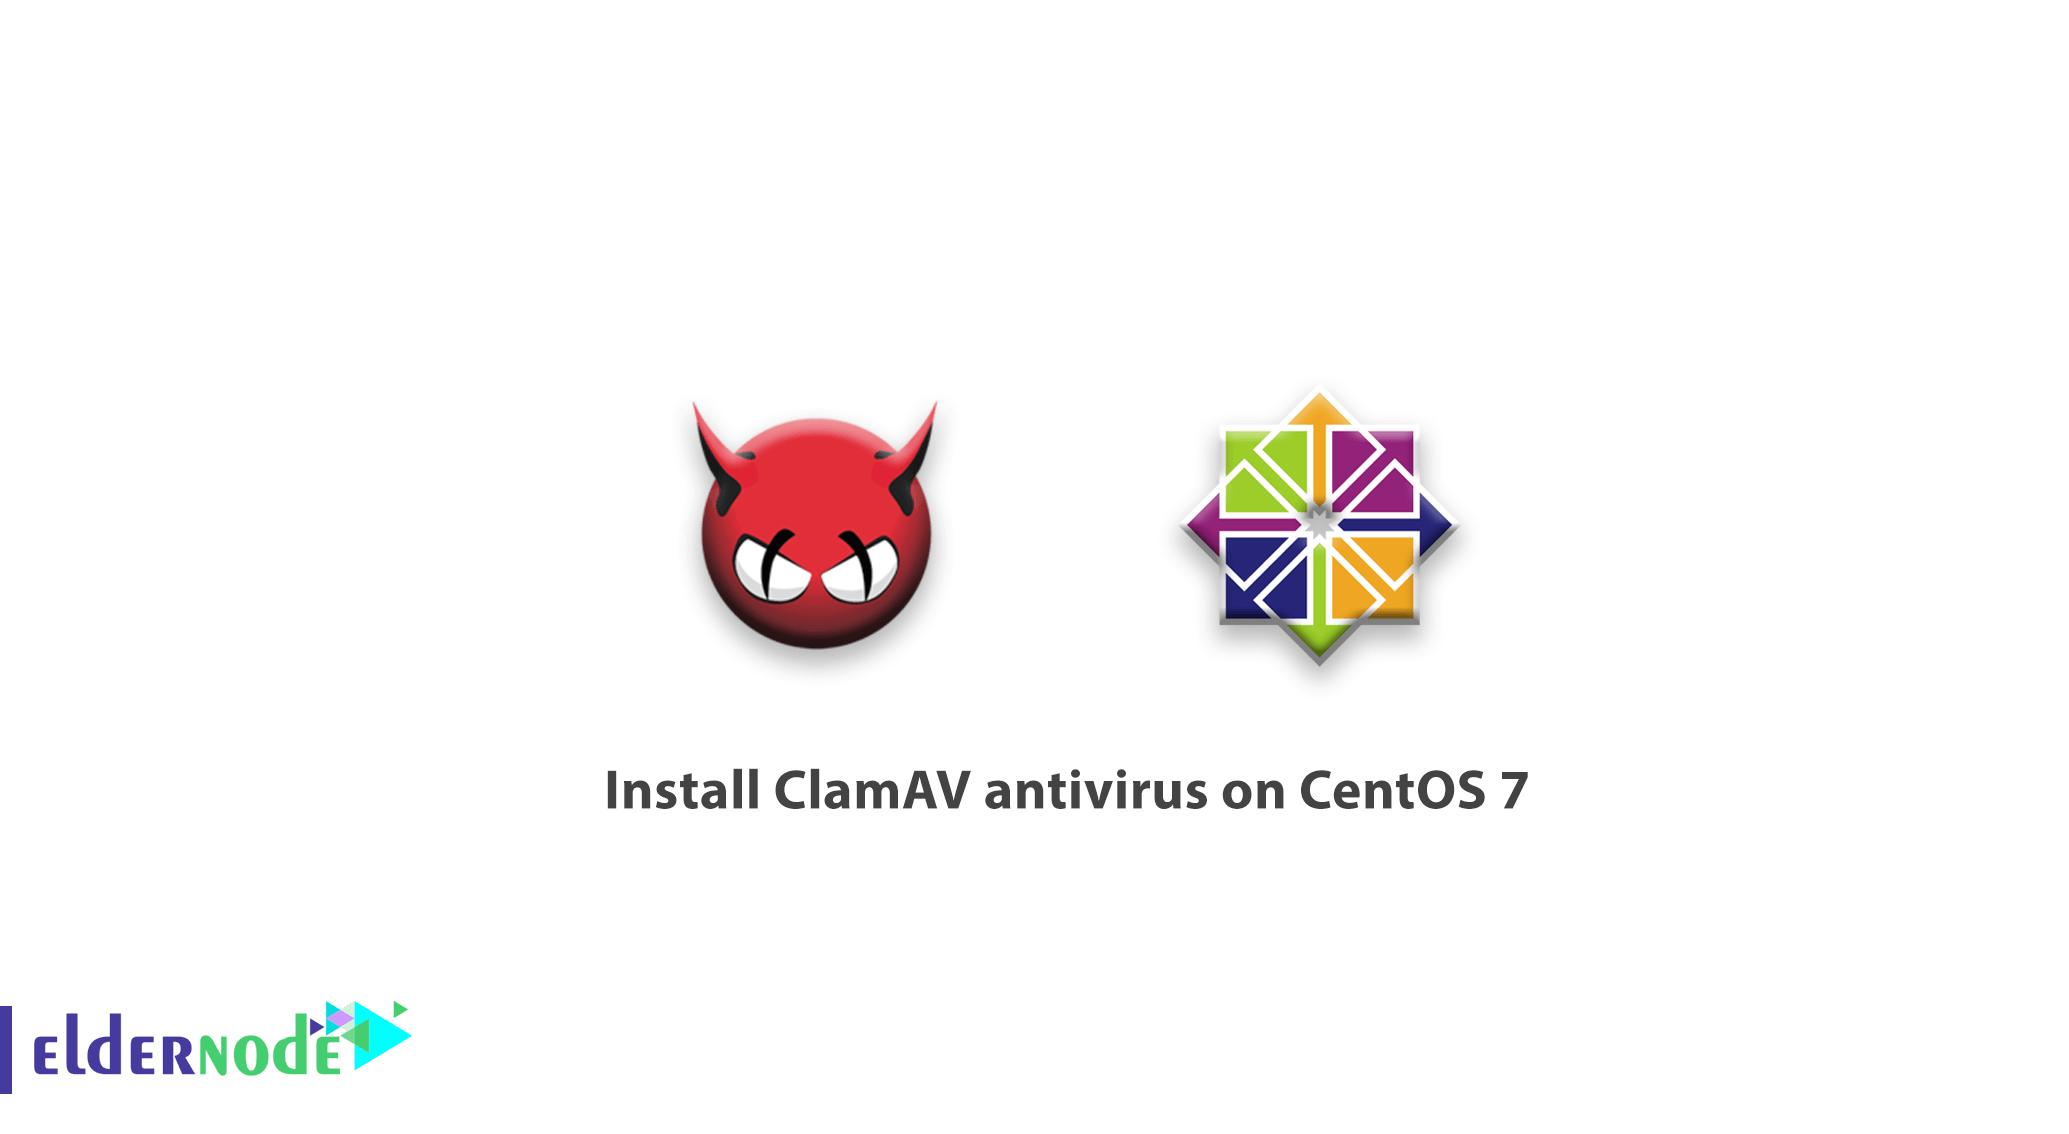 Install ClamAV antivirus on CentOS 7